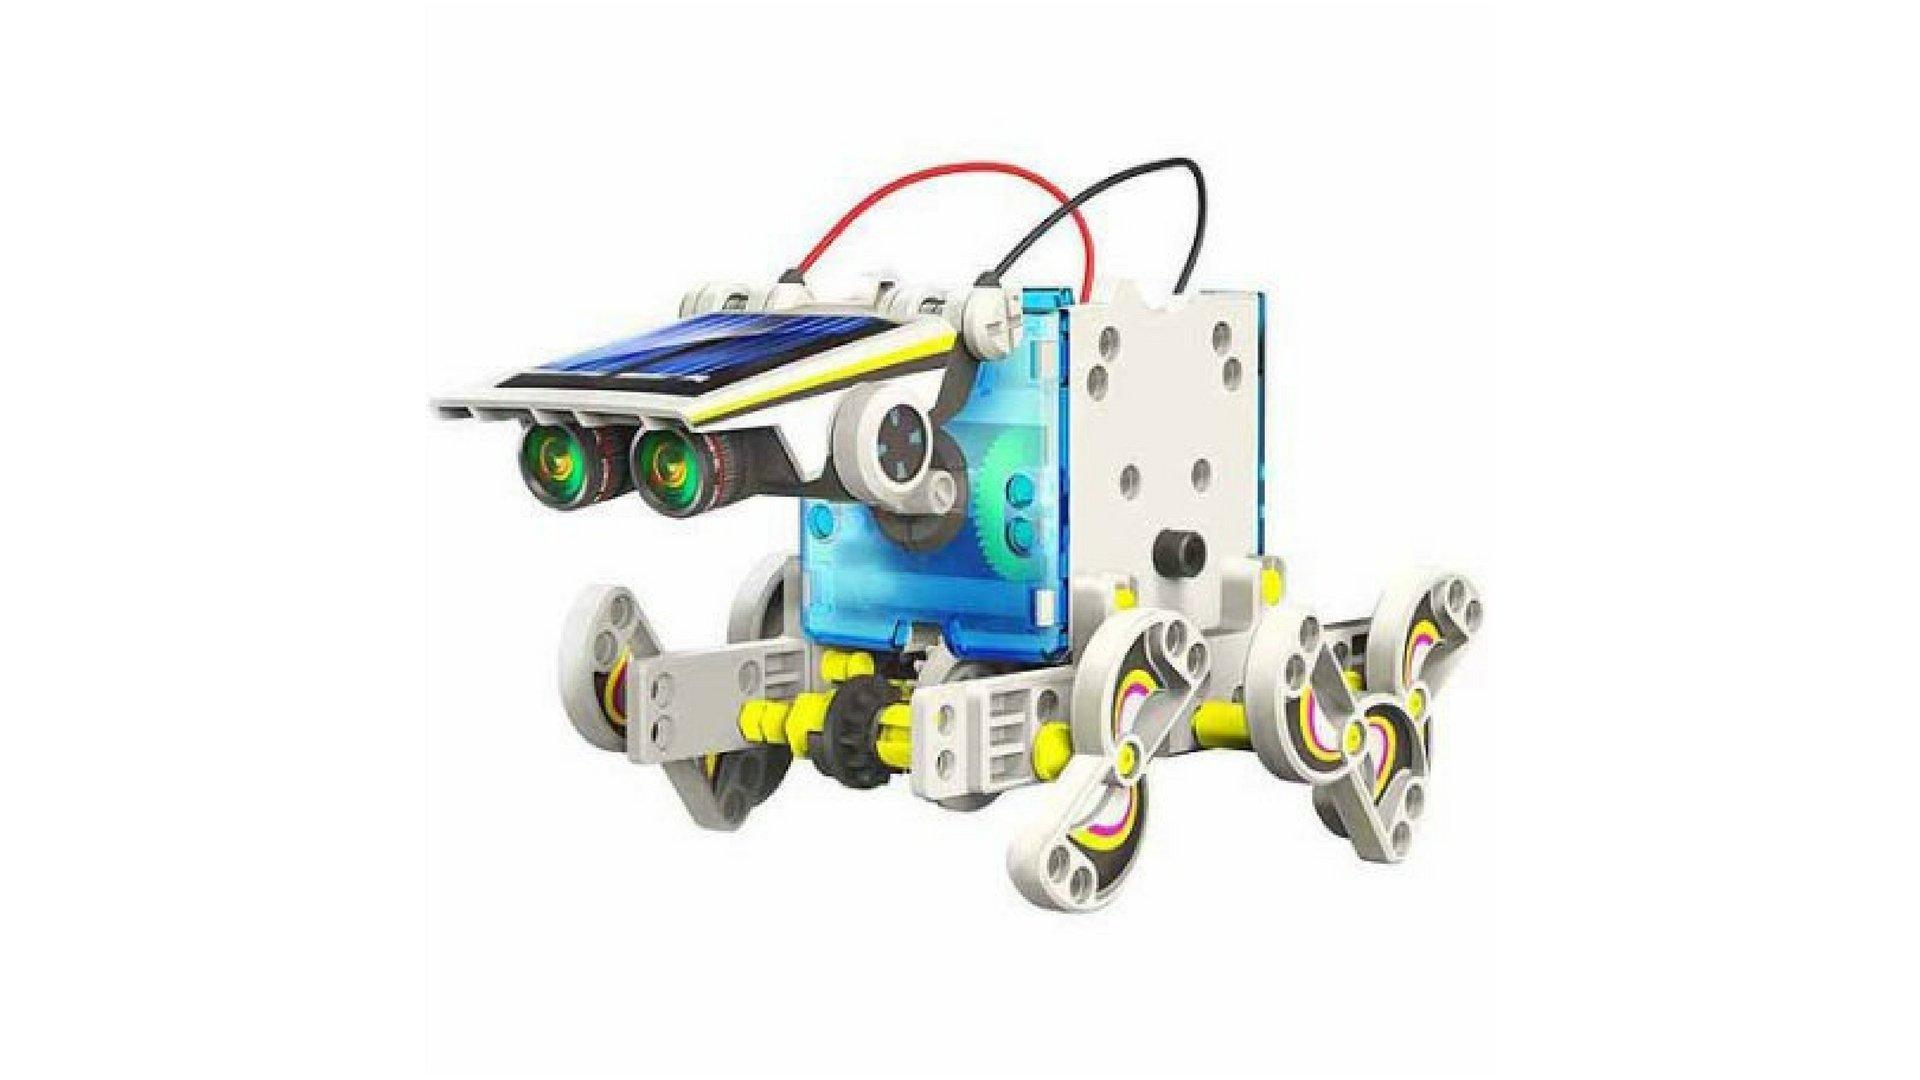 OWI Robotikits 14-in-1 Educational Solar Robot Kit Set of 2 by Elenco* (Image #2)